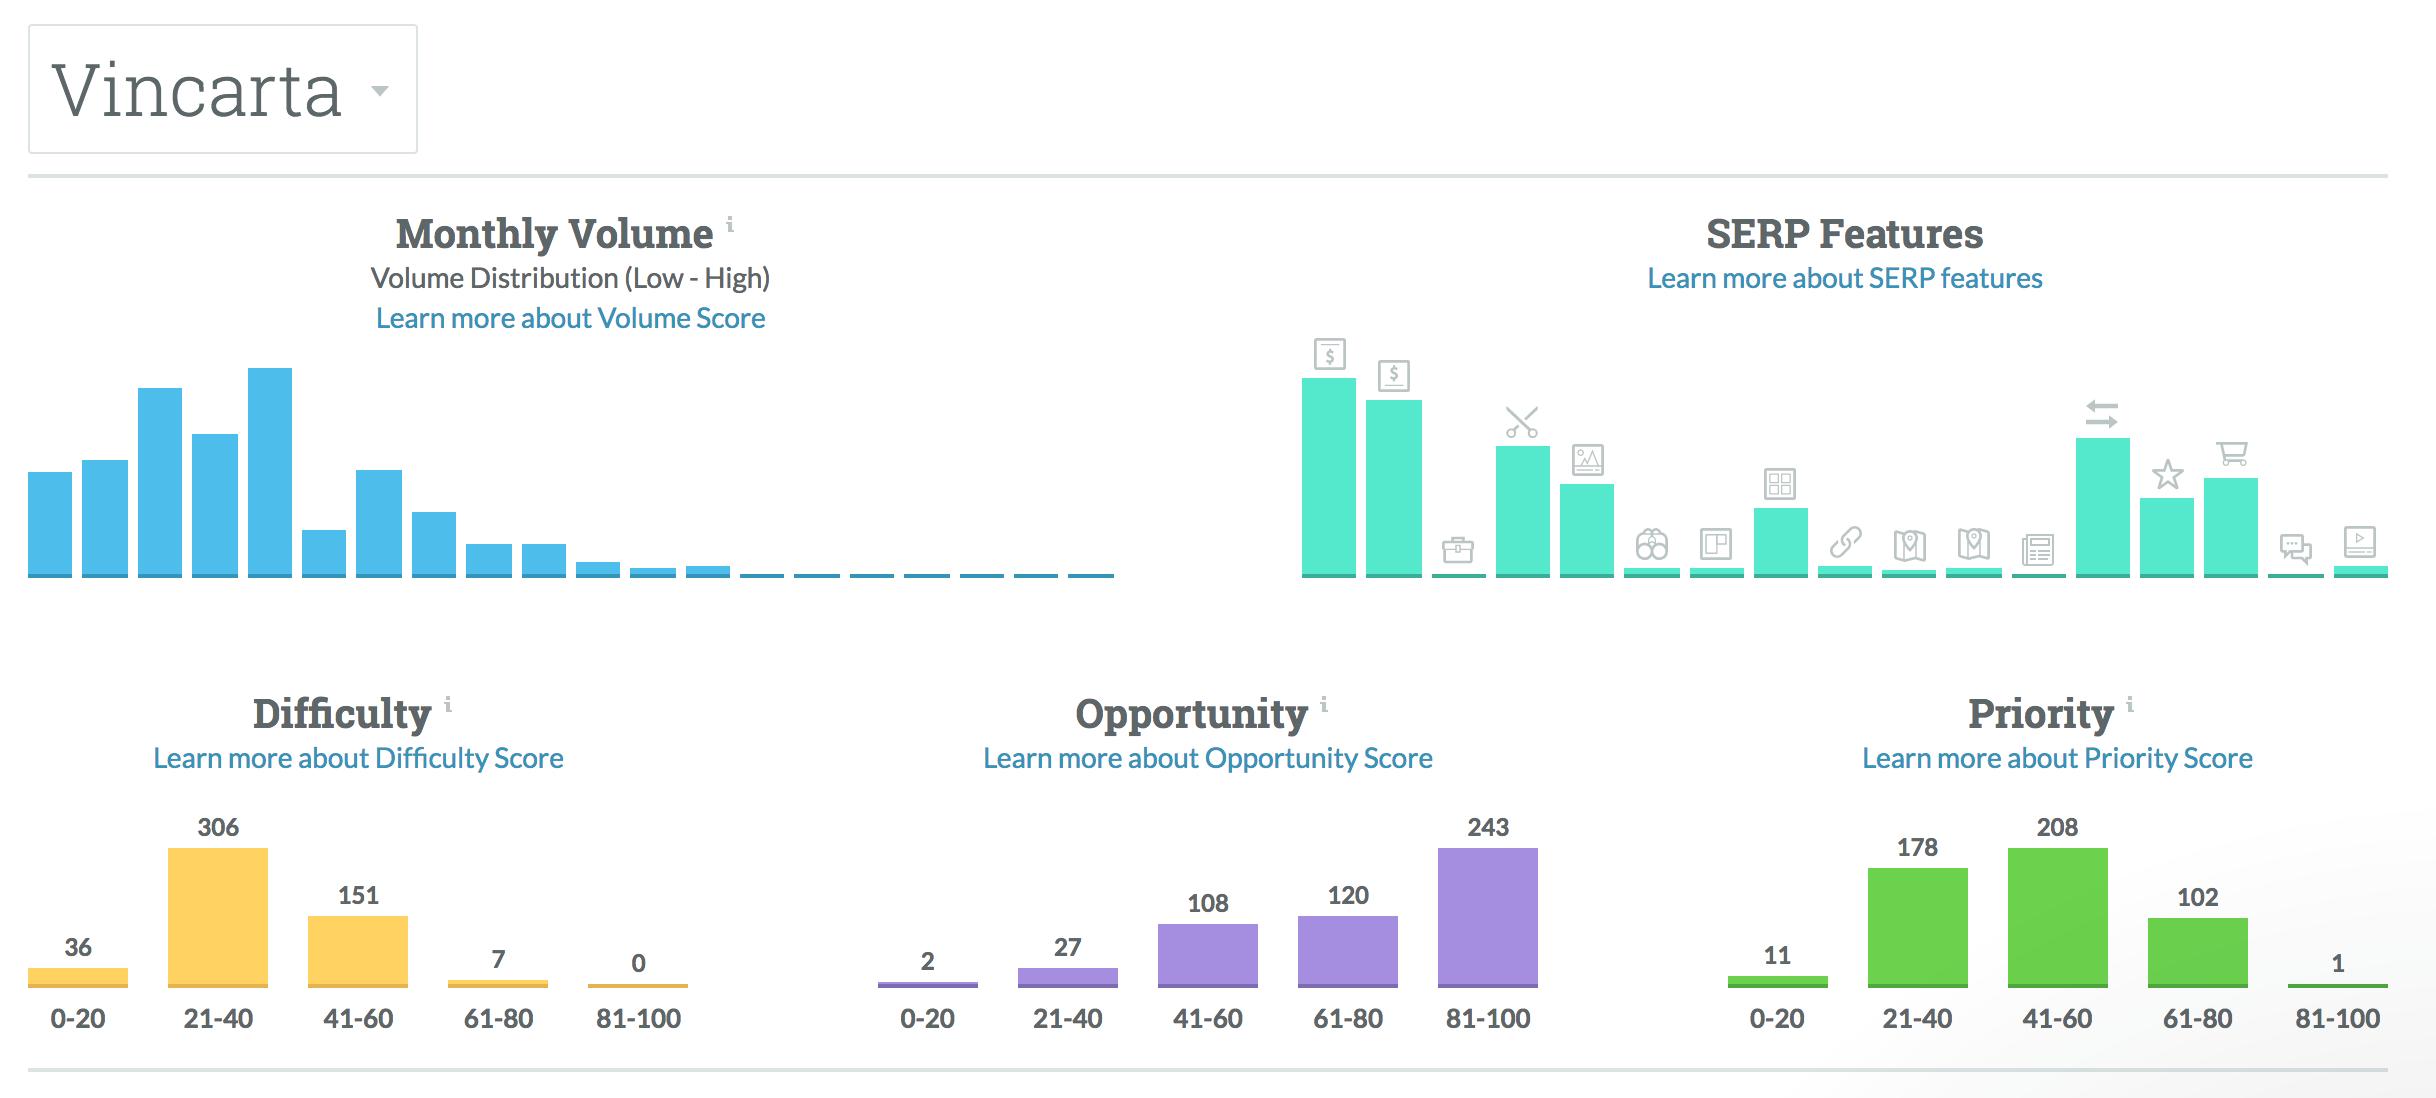 Keyword analysis for Vincarta in Moz.com